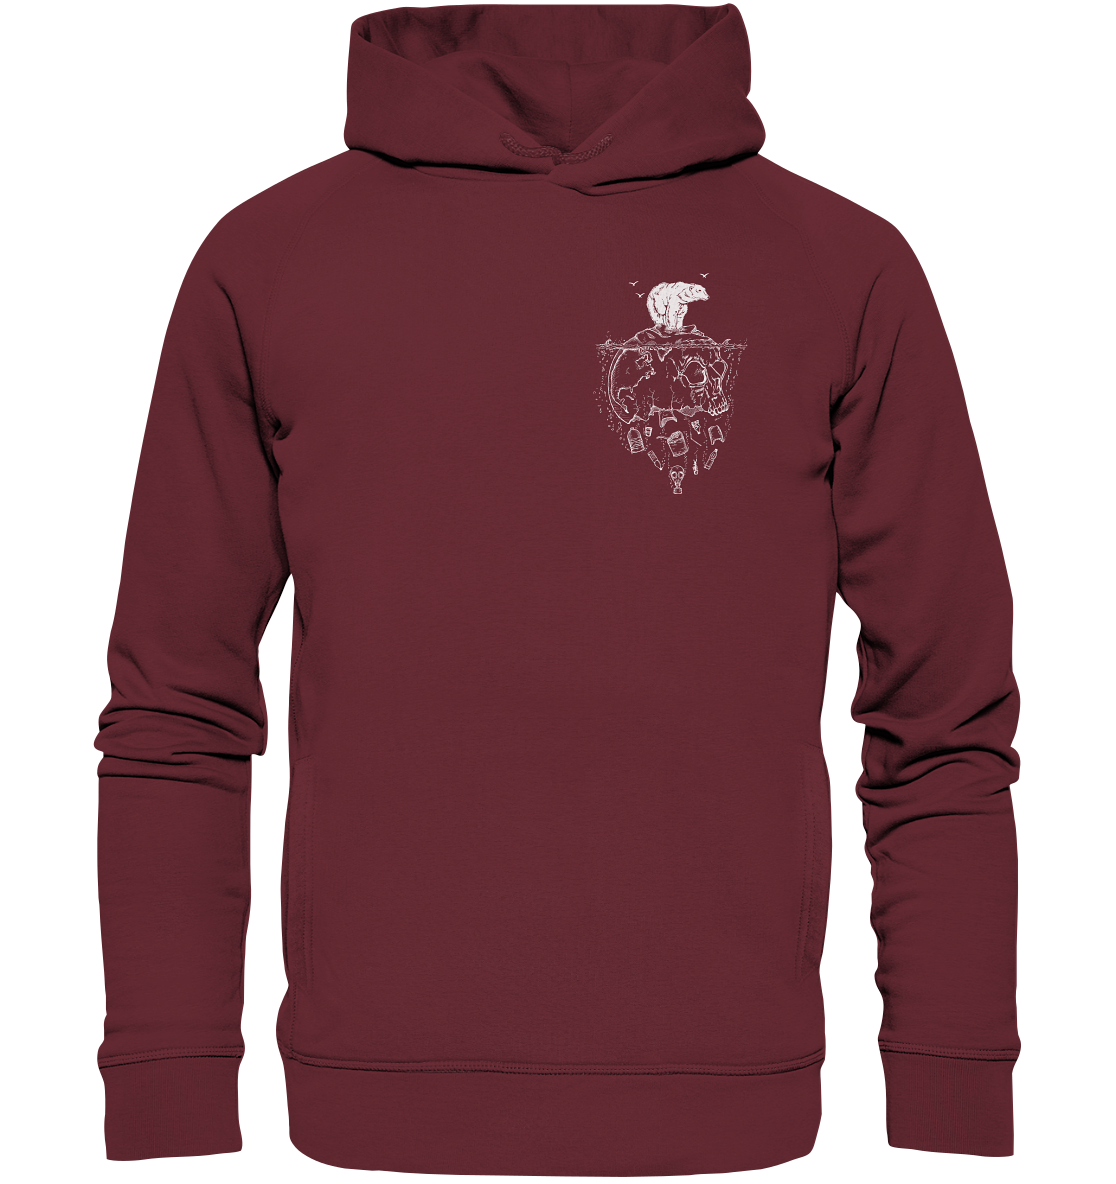 front-organic-fashion-hoodie-672b34-1116x-16.png